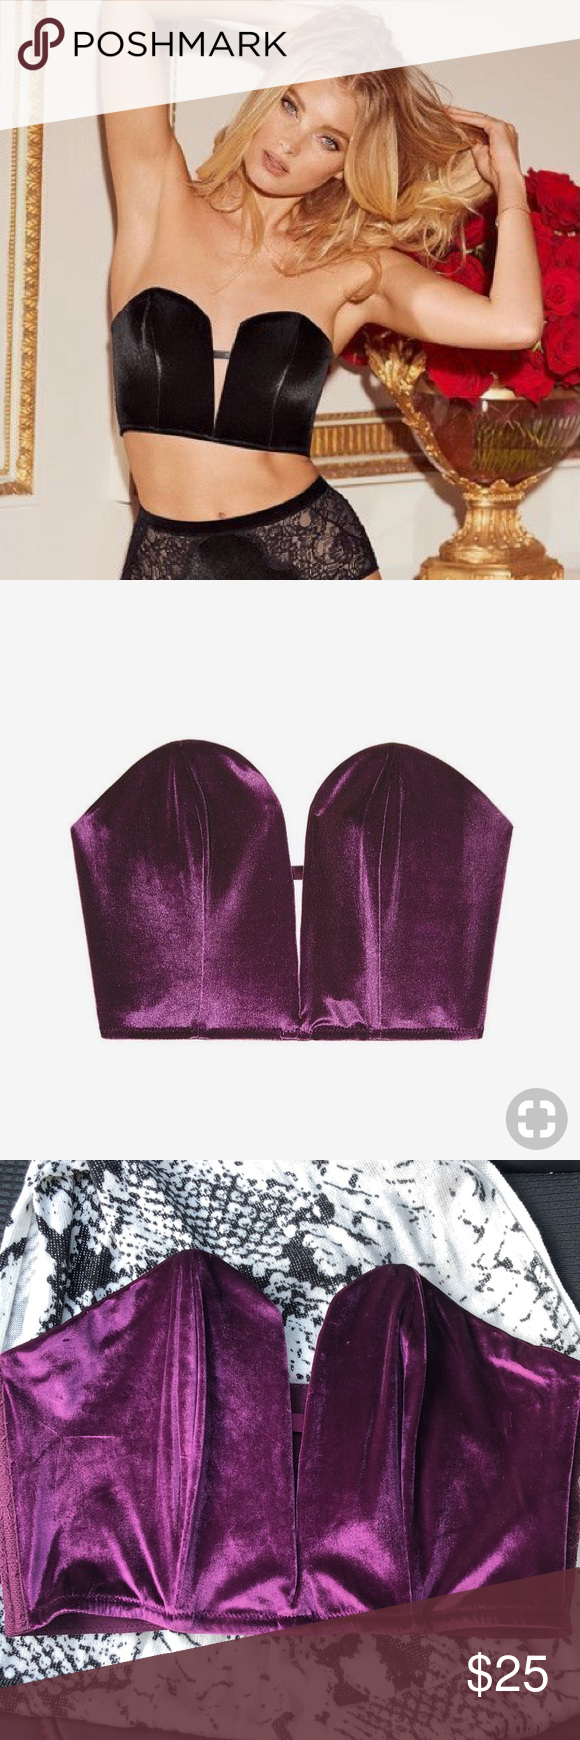 2485a87642e Victoria s Secret Plum velvet mini bustier. Size M BRAND NEW!! Dream Angels  mini corset bra. Victoria s Secret Intimates   Sleepwear Bras